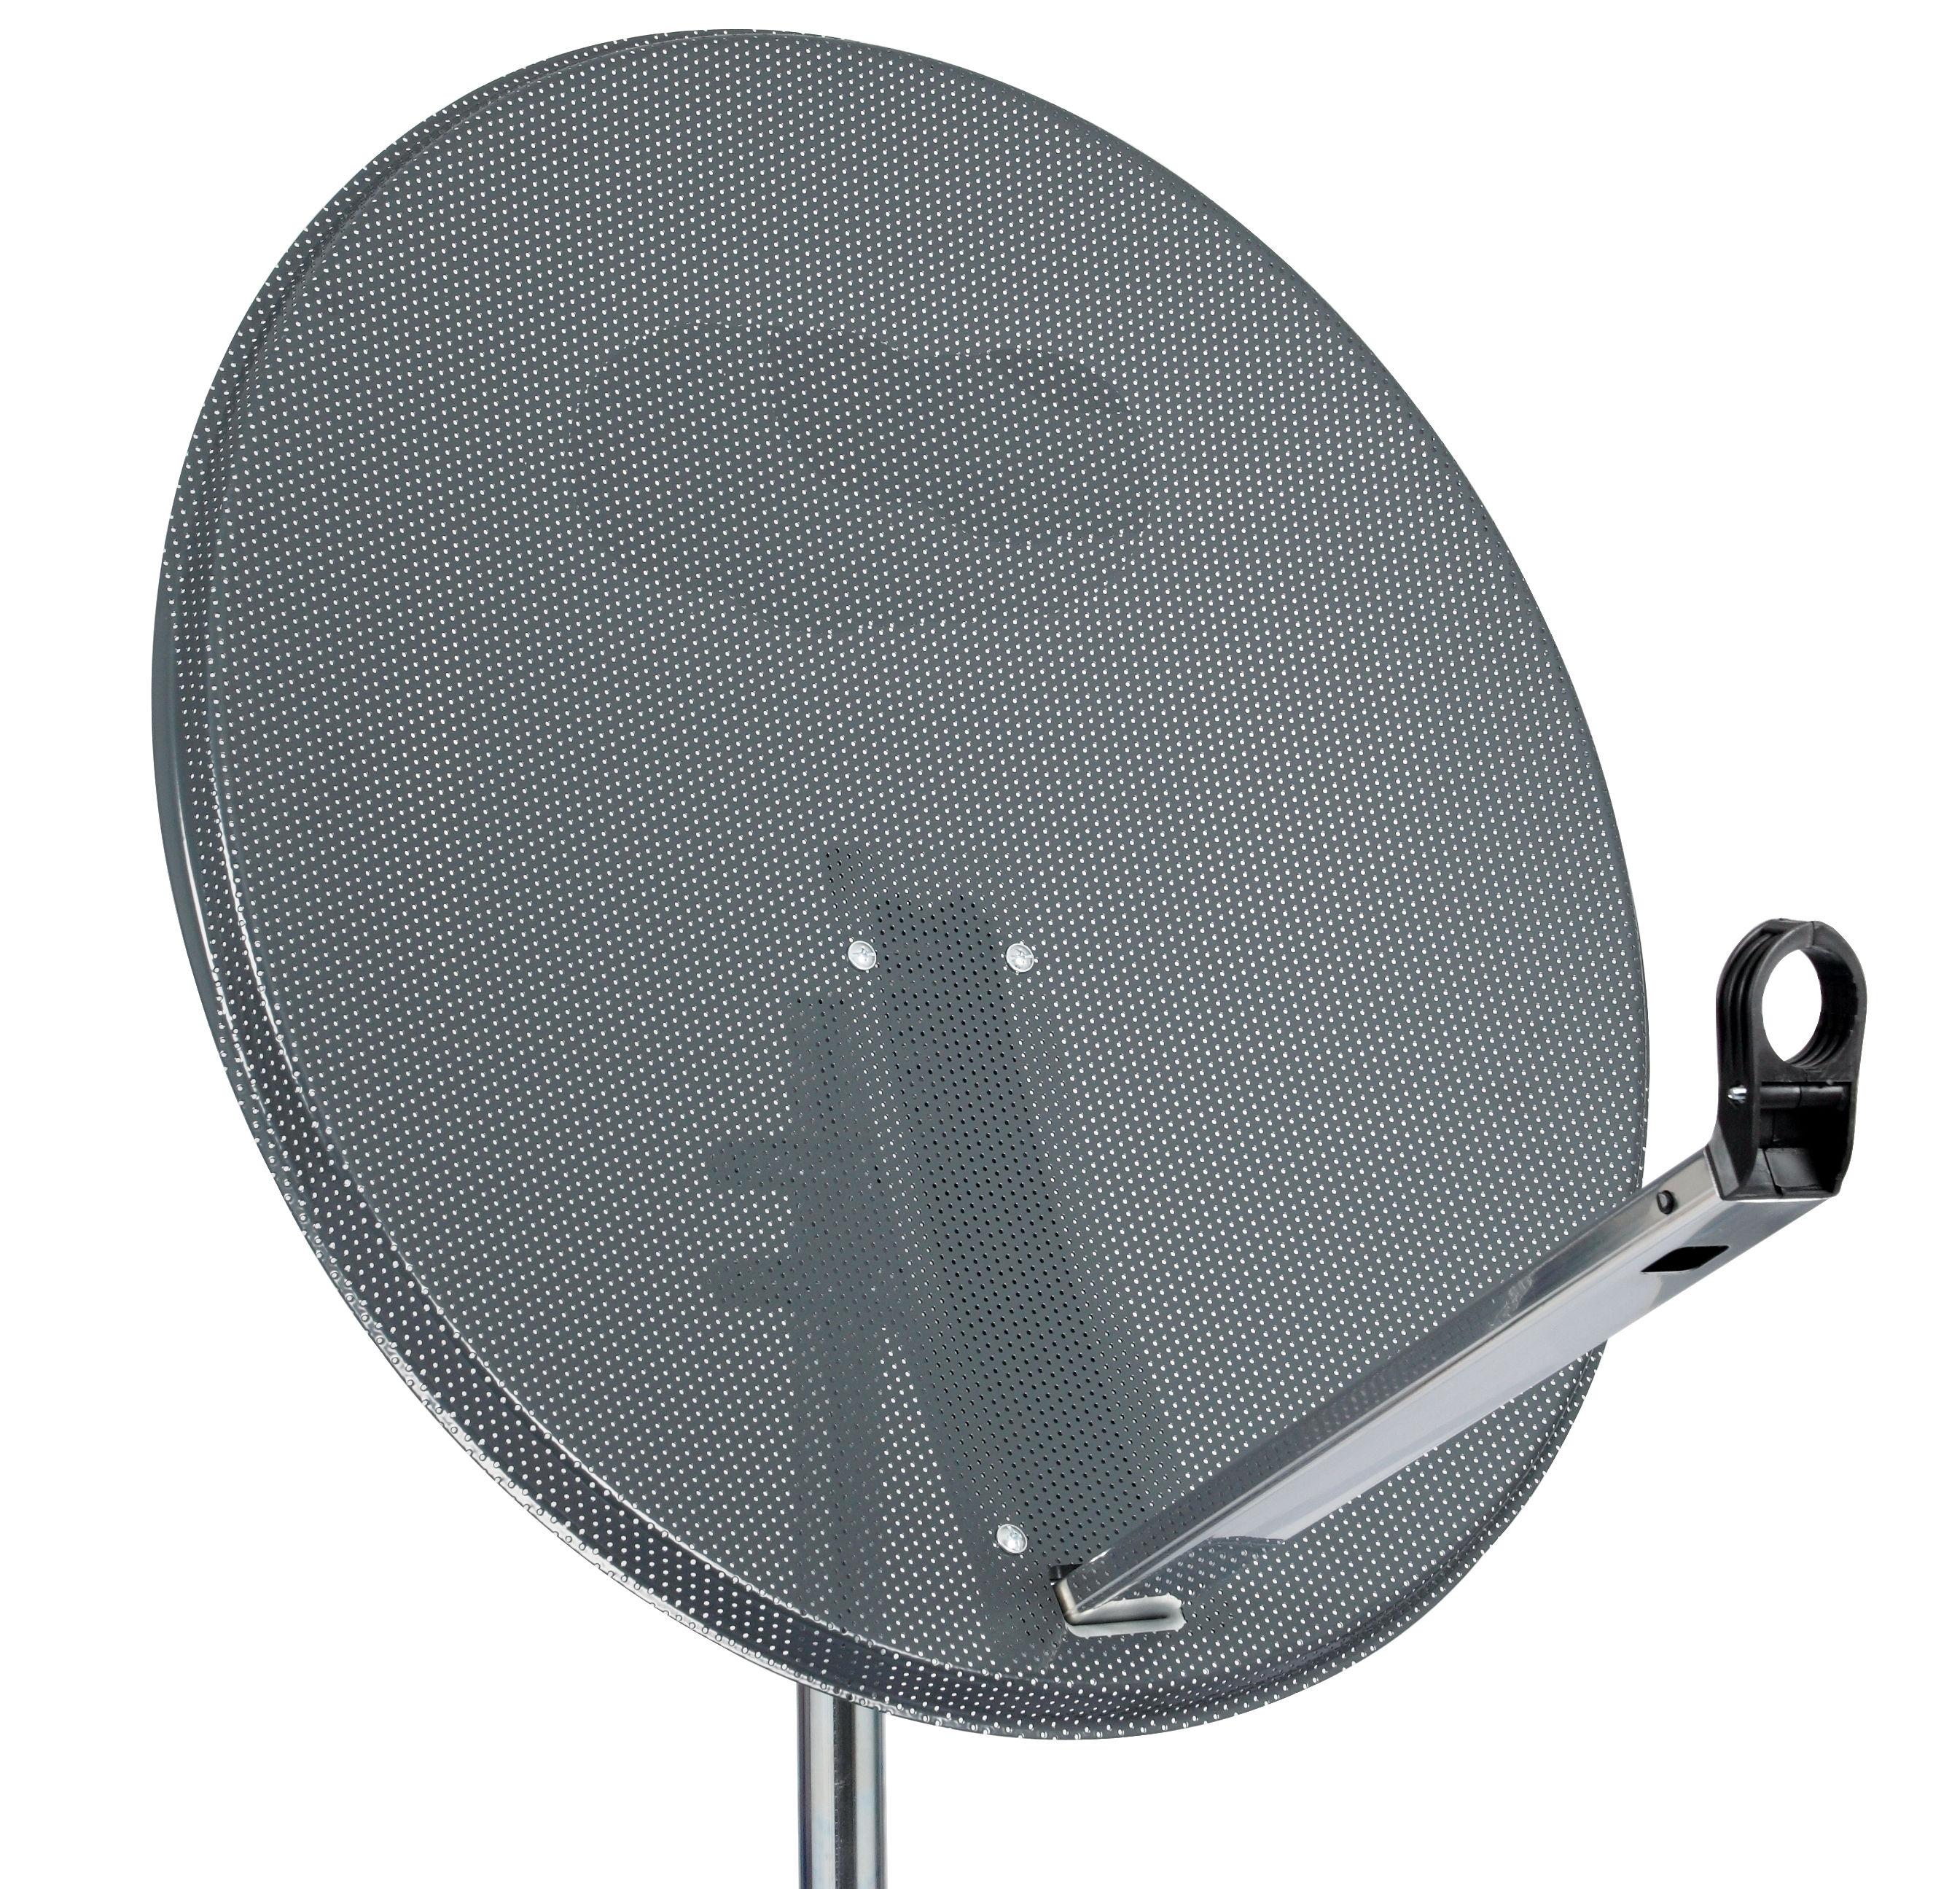 1m Mesh Satellite Dish (S97)